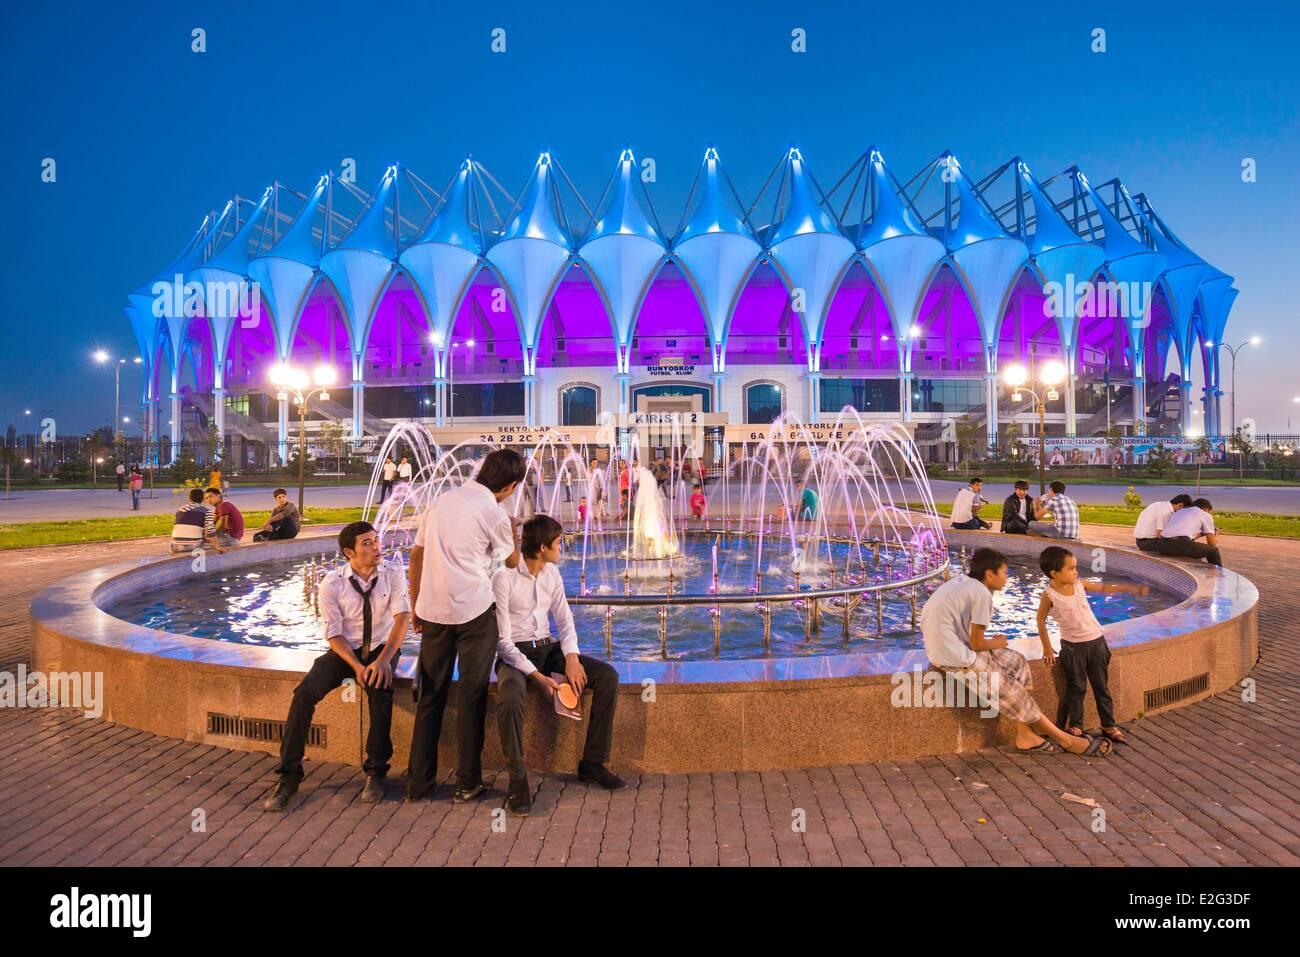 Uzbekistan Silk road Tashkent the new Bunyodkor stadium opened in august 2012 and build by GMP Architekten Stock Photo